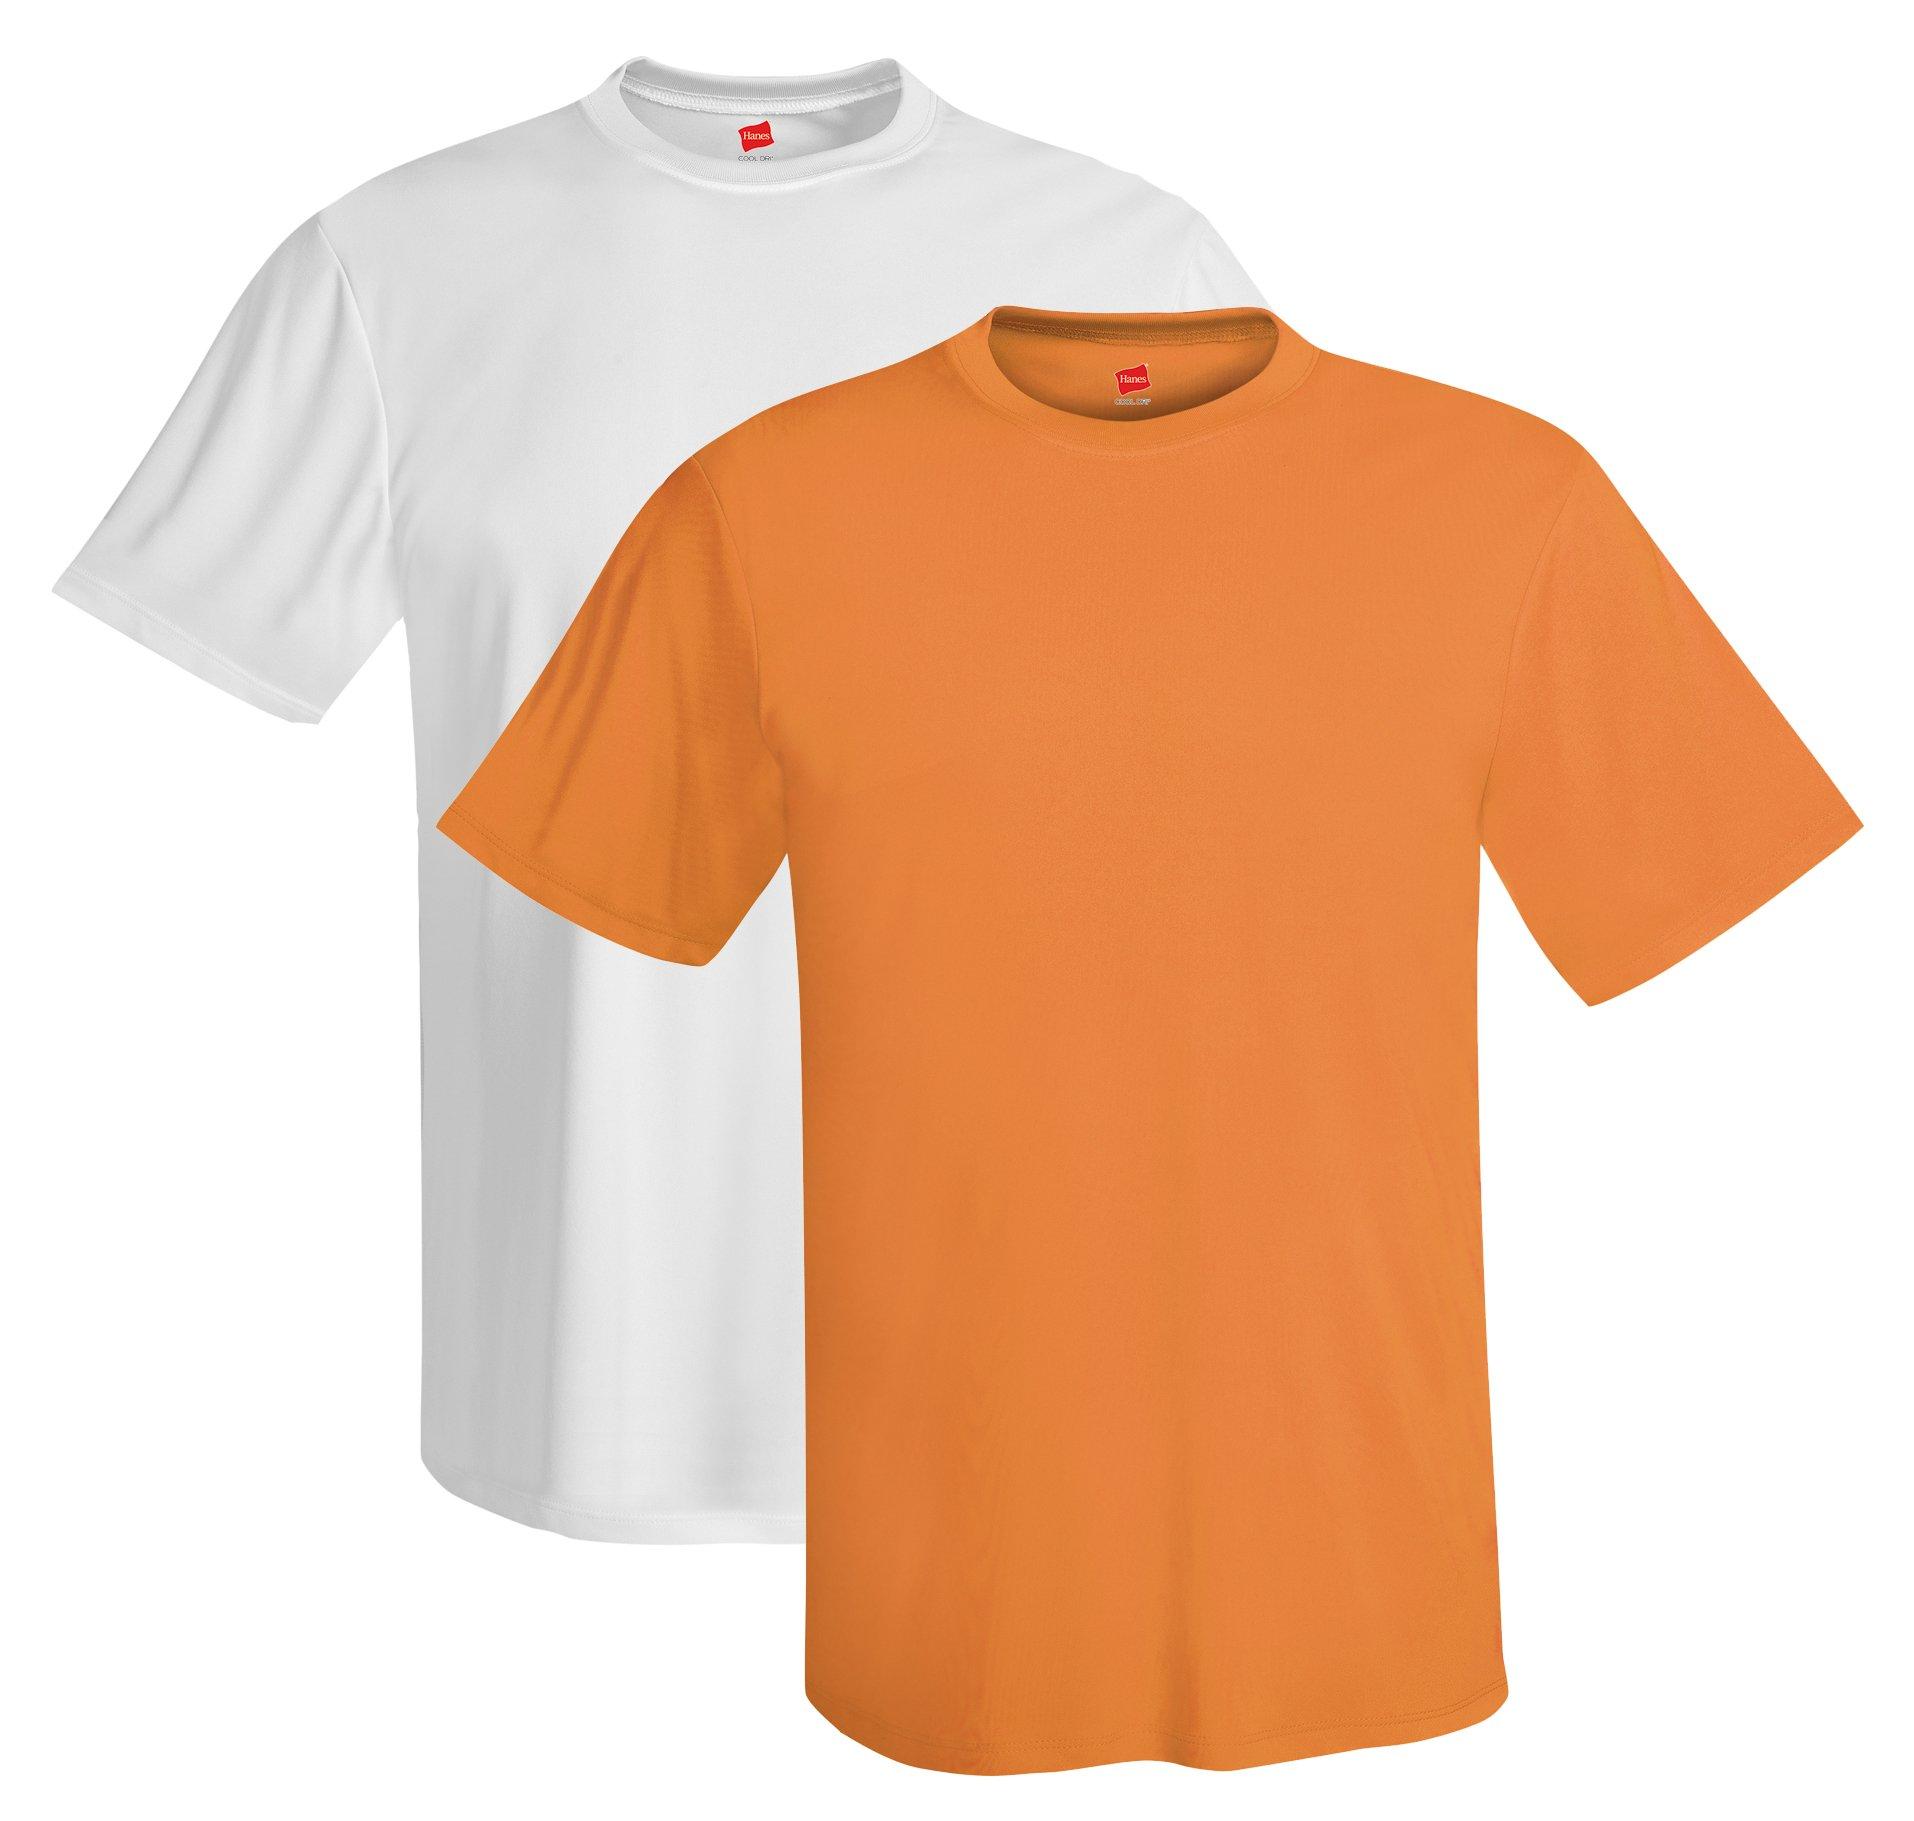 Hanes mens 4 oz. Cool Dri T-Shirt(4820)-Safety Orange/White-L